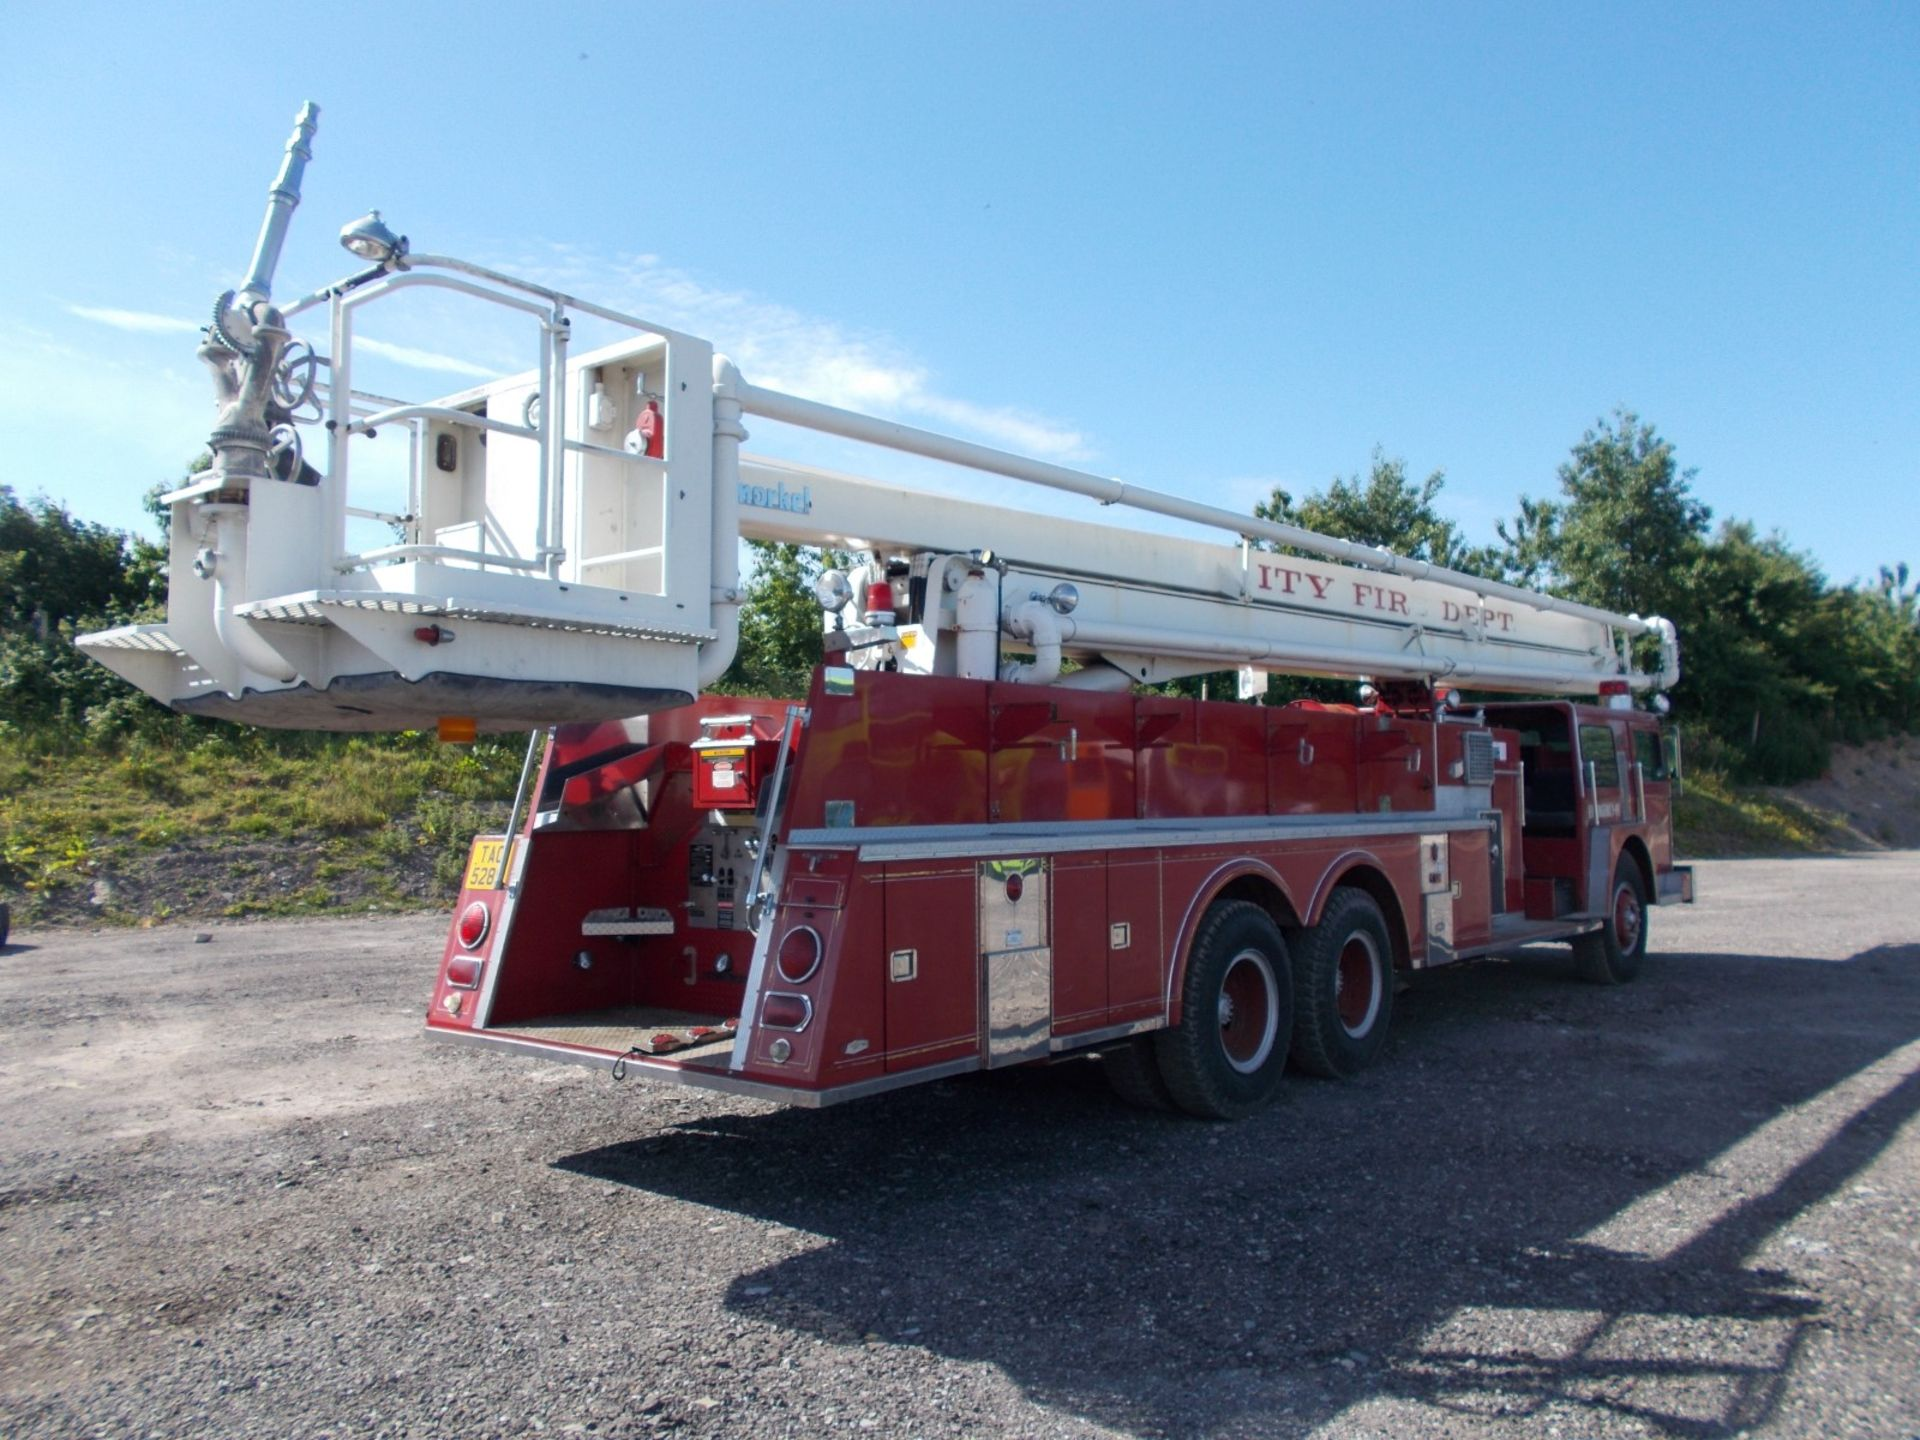 1978 HENDRICKSON 871-LPS SNORKEL FIRE TRUCK, U.S. IMPORT, 7.0 LITRE DETROIT DIESEL ENGINE *PLUS VAT* - Image 5 of 22